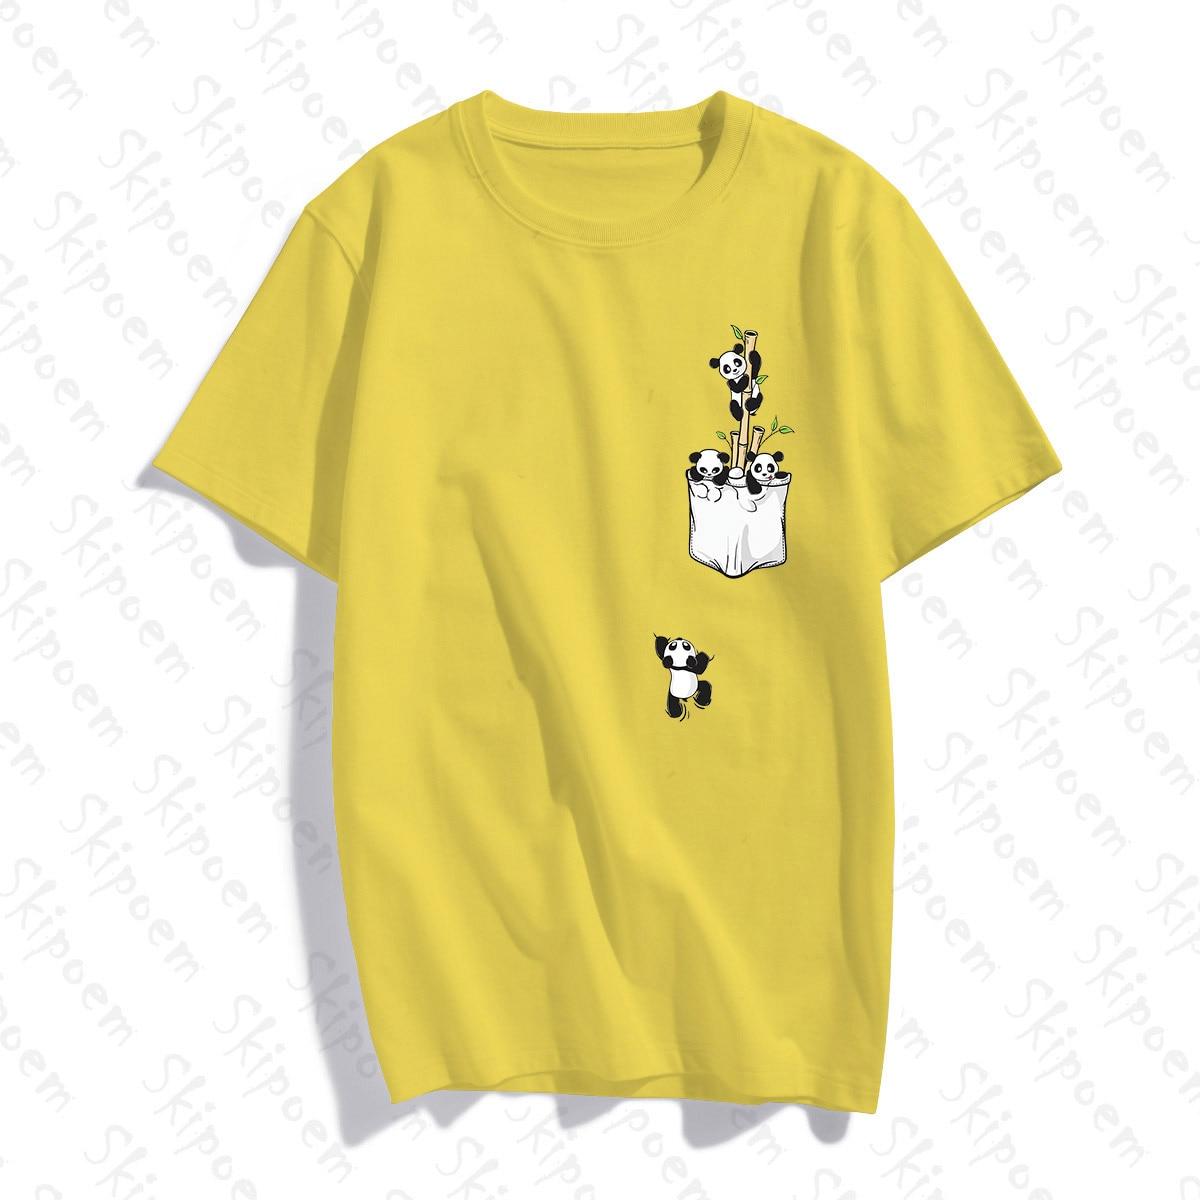 A Panda Dropped From His Pocket Women Tshirt Pink Aesthetic Vintage Harajuku Short Sleeve 8 Colors Cotton Streetwear Summer Tops|T-Shirts| - AliExpress